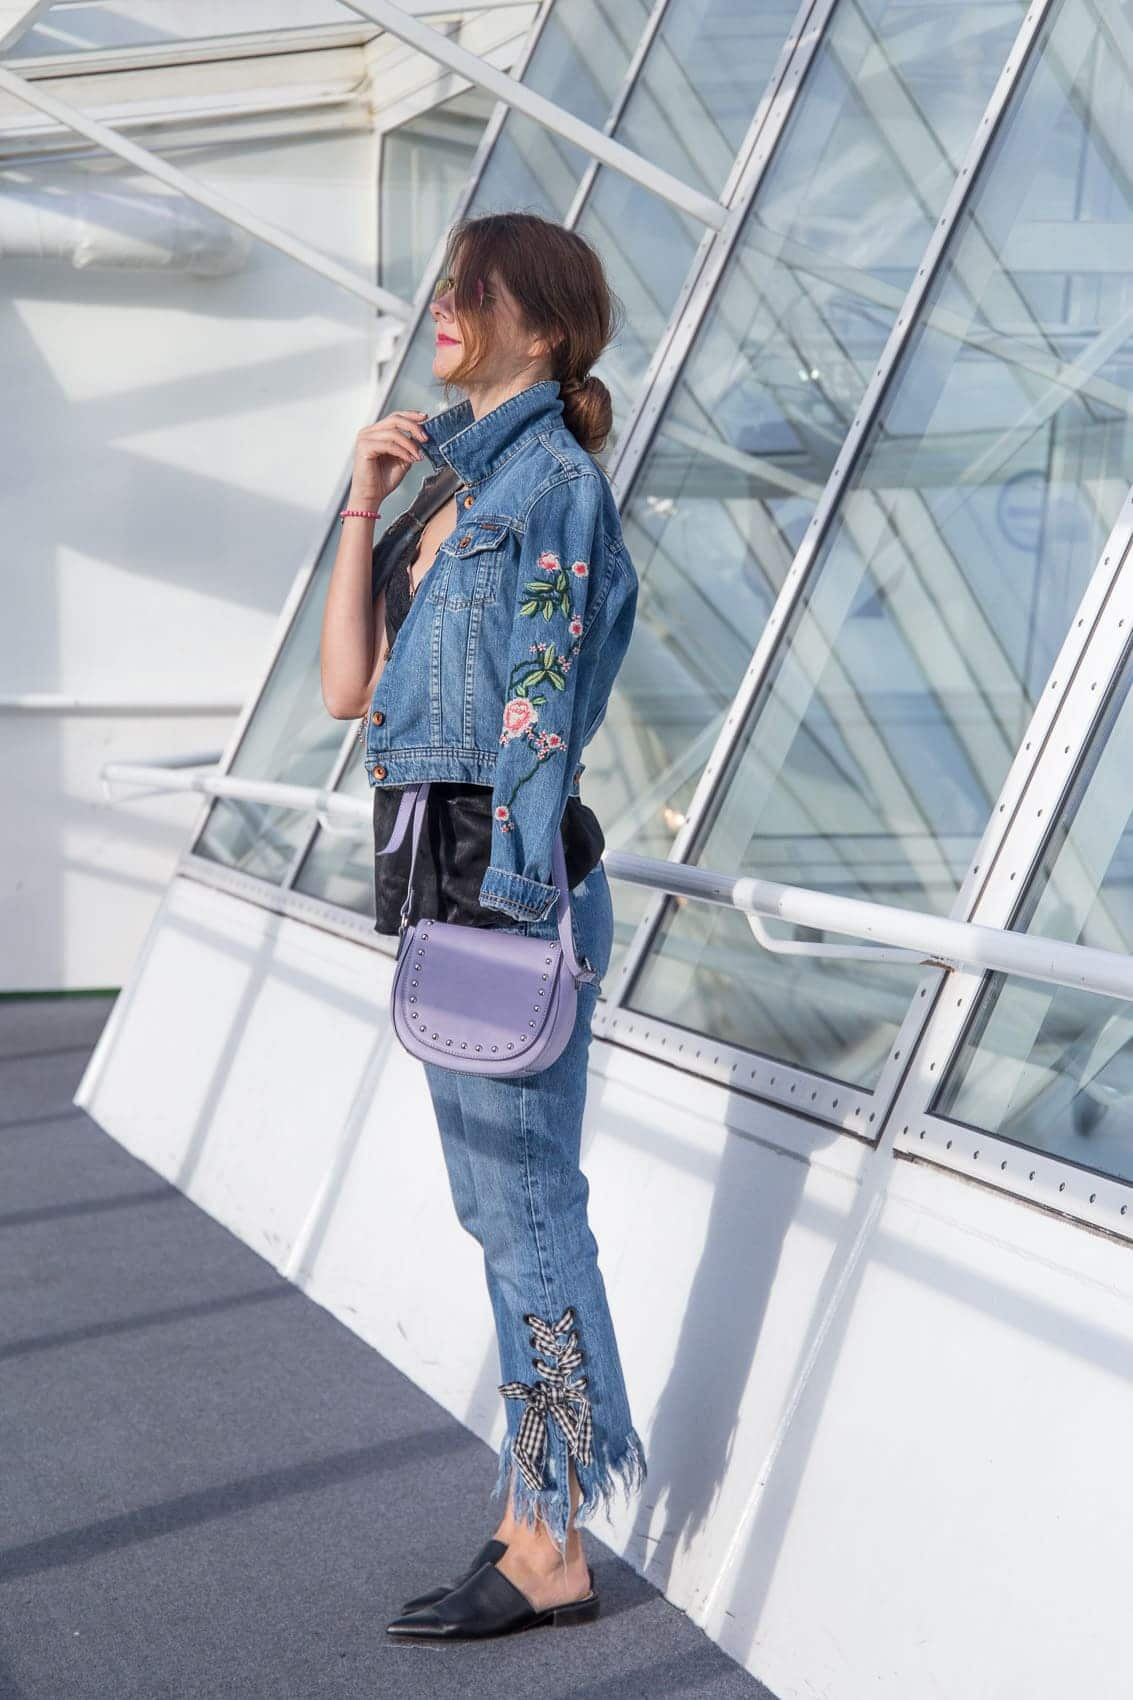 Sommer Outfits auf Des Belles Choses